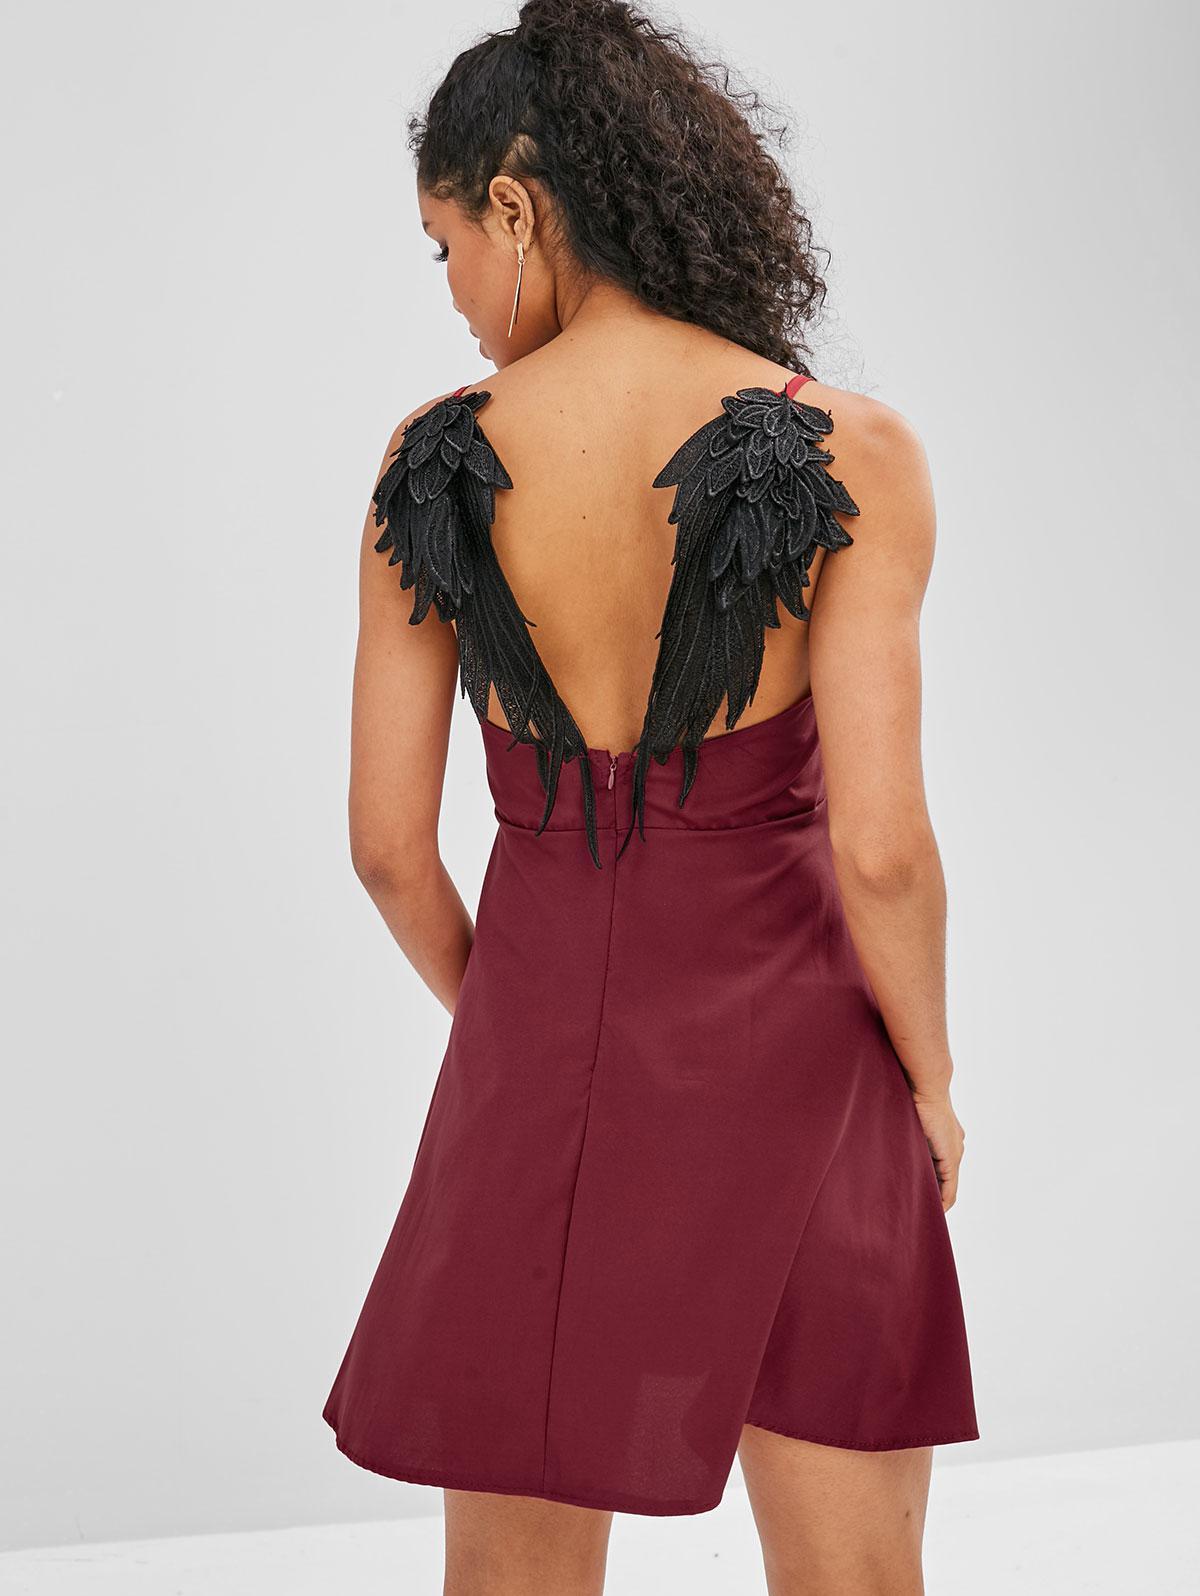 Wing Applique Open Back Dress